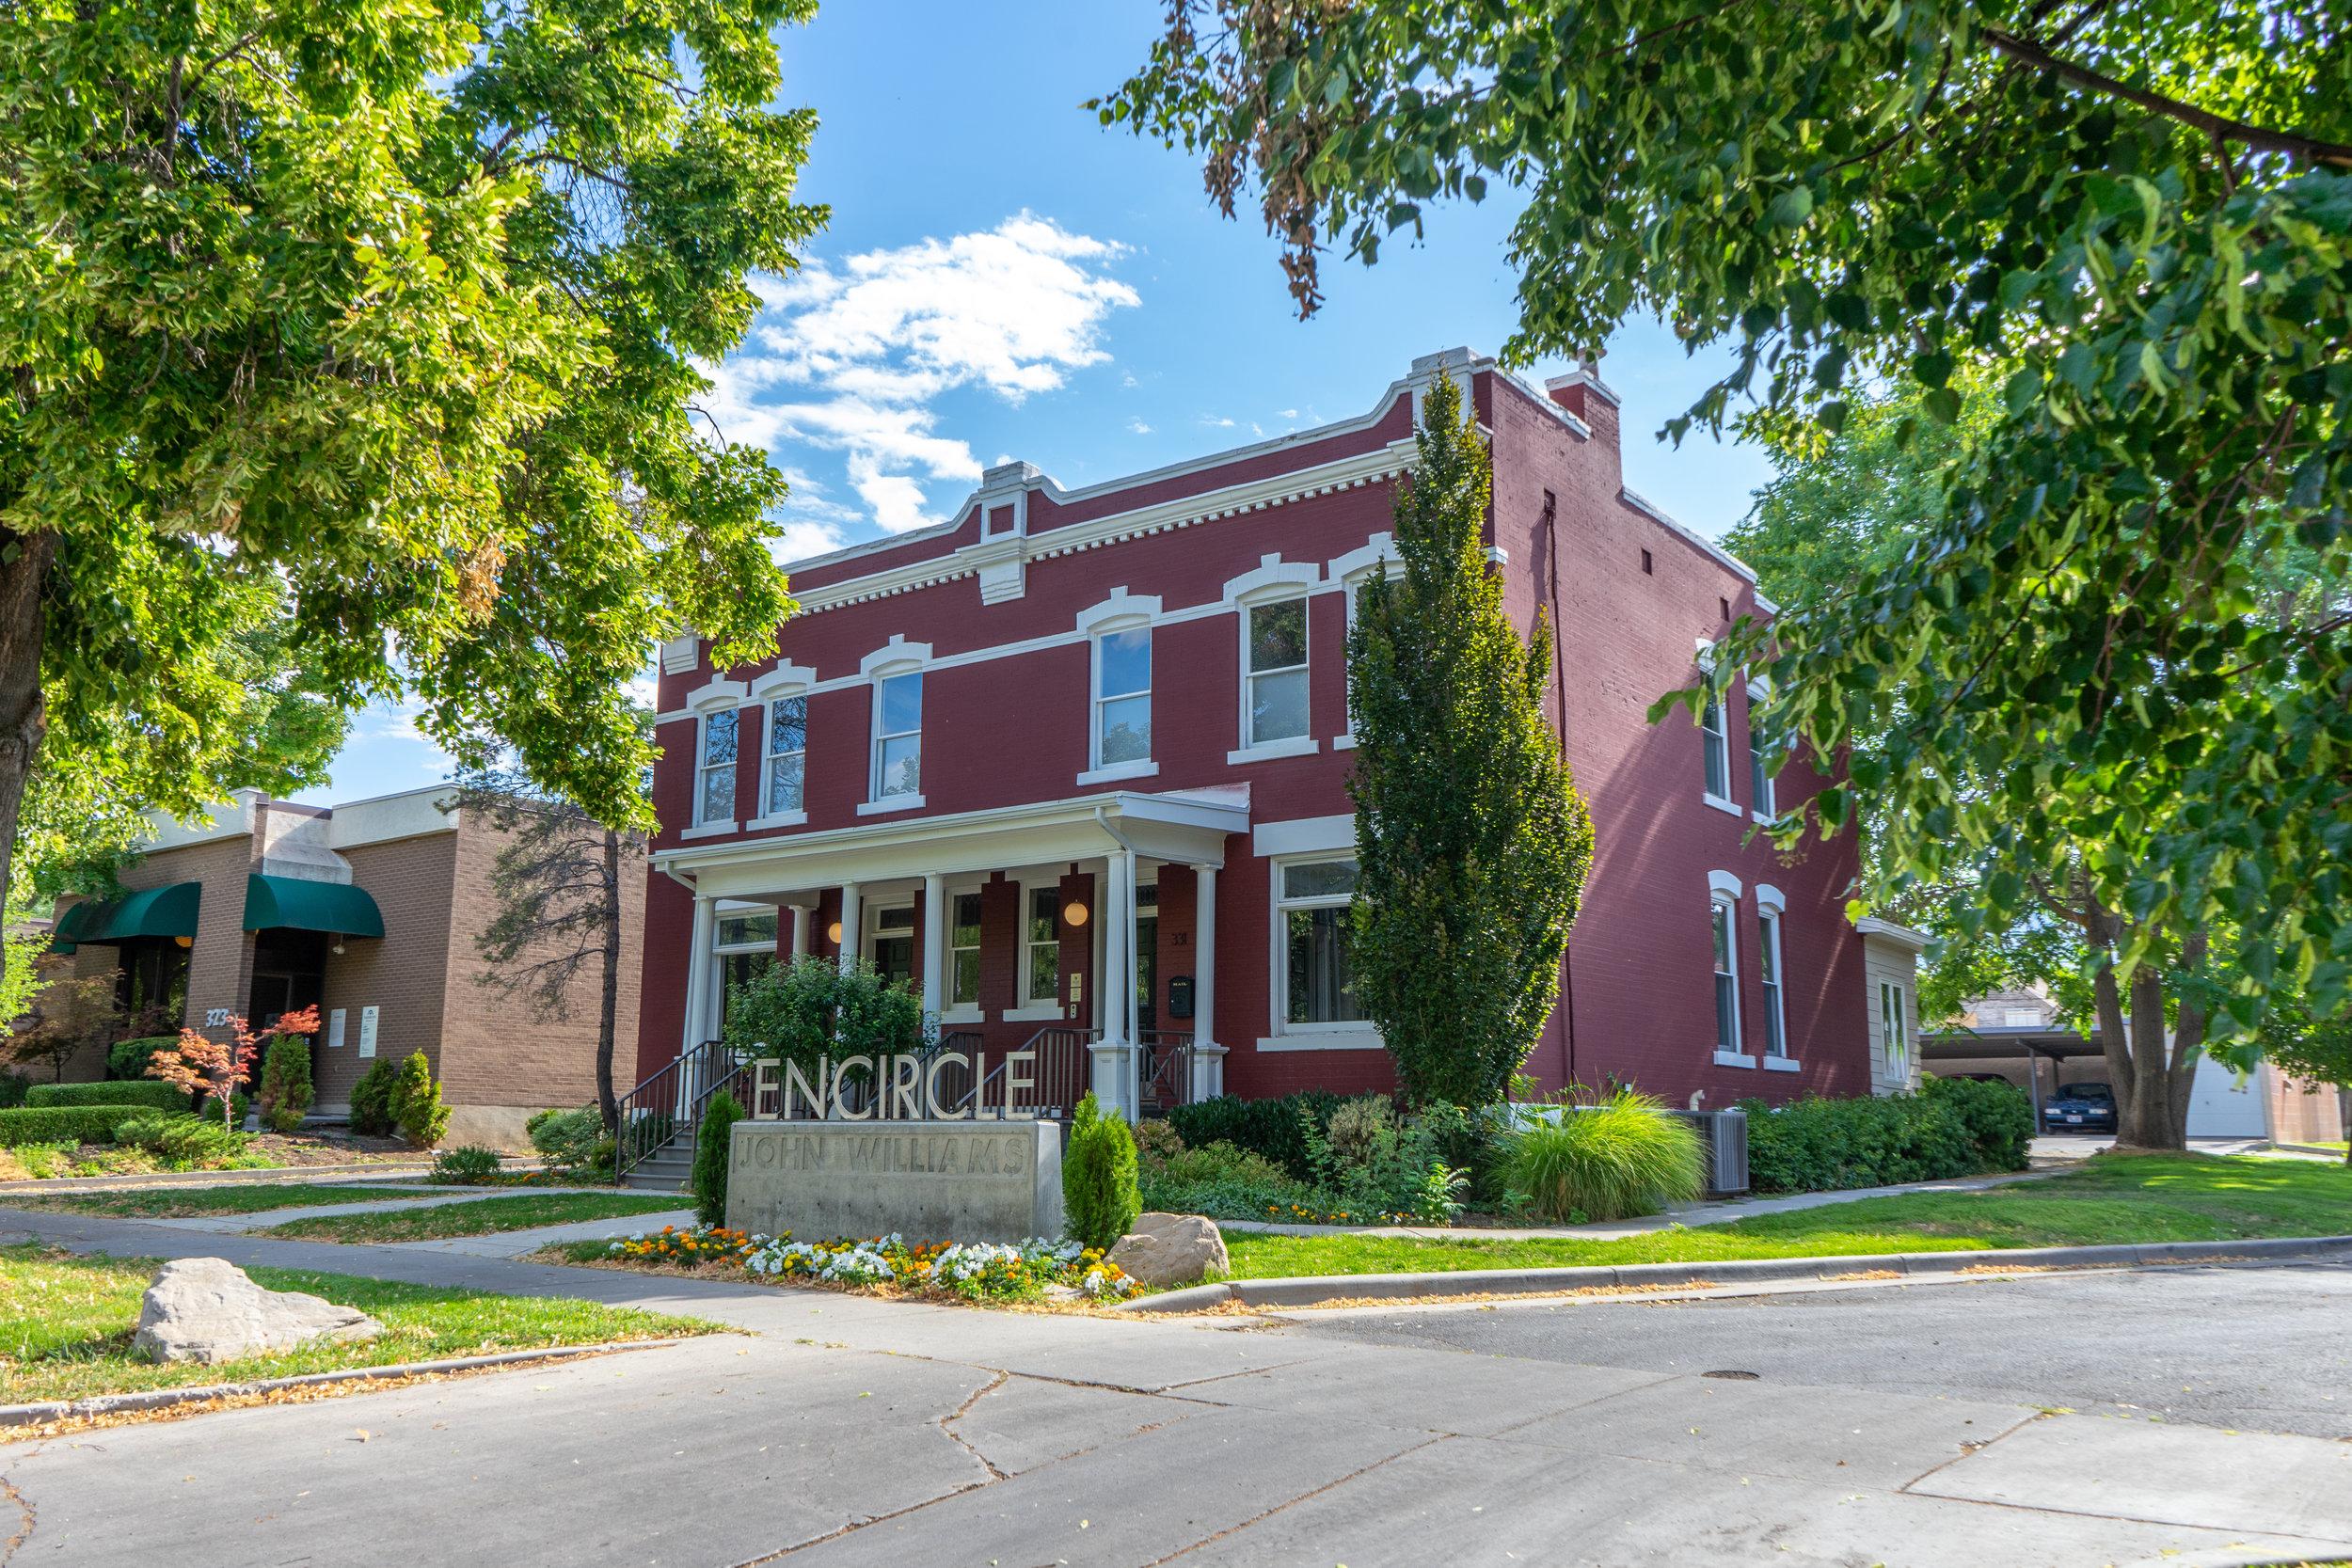 The John Williams Encircle Home - Salt Lake City, UT